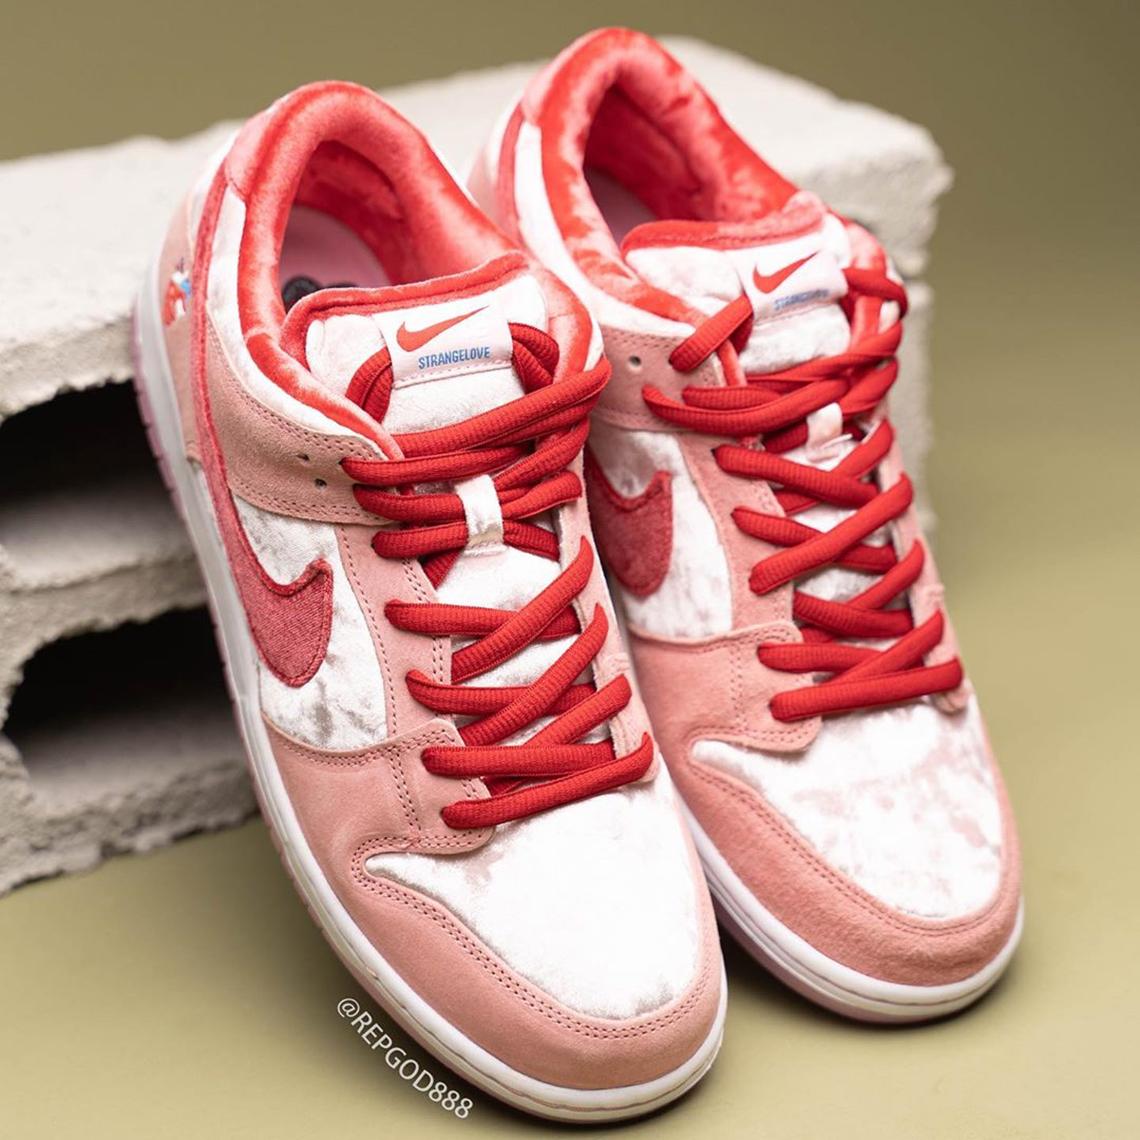 StrangeLove Nike SB Dunk Low CT2552-800 Release Info ...